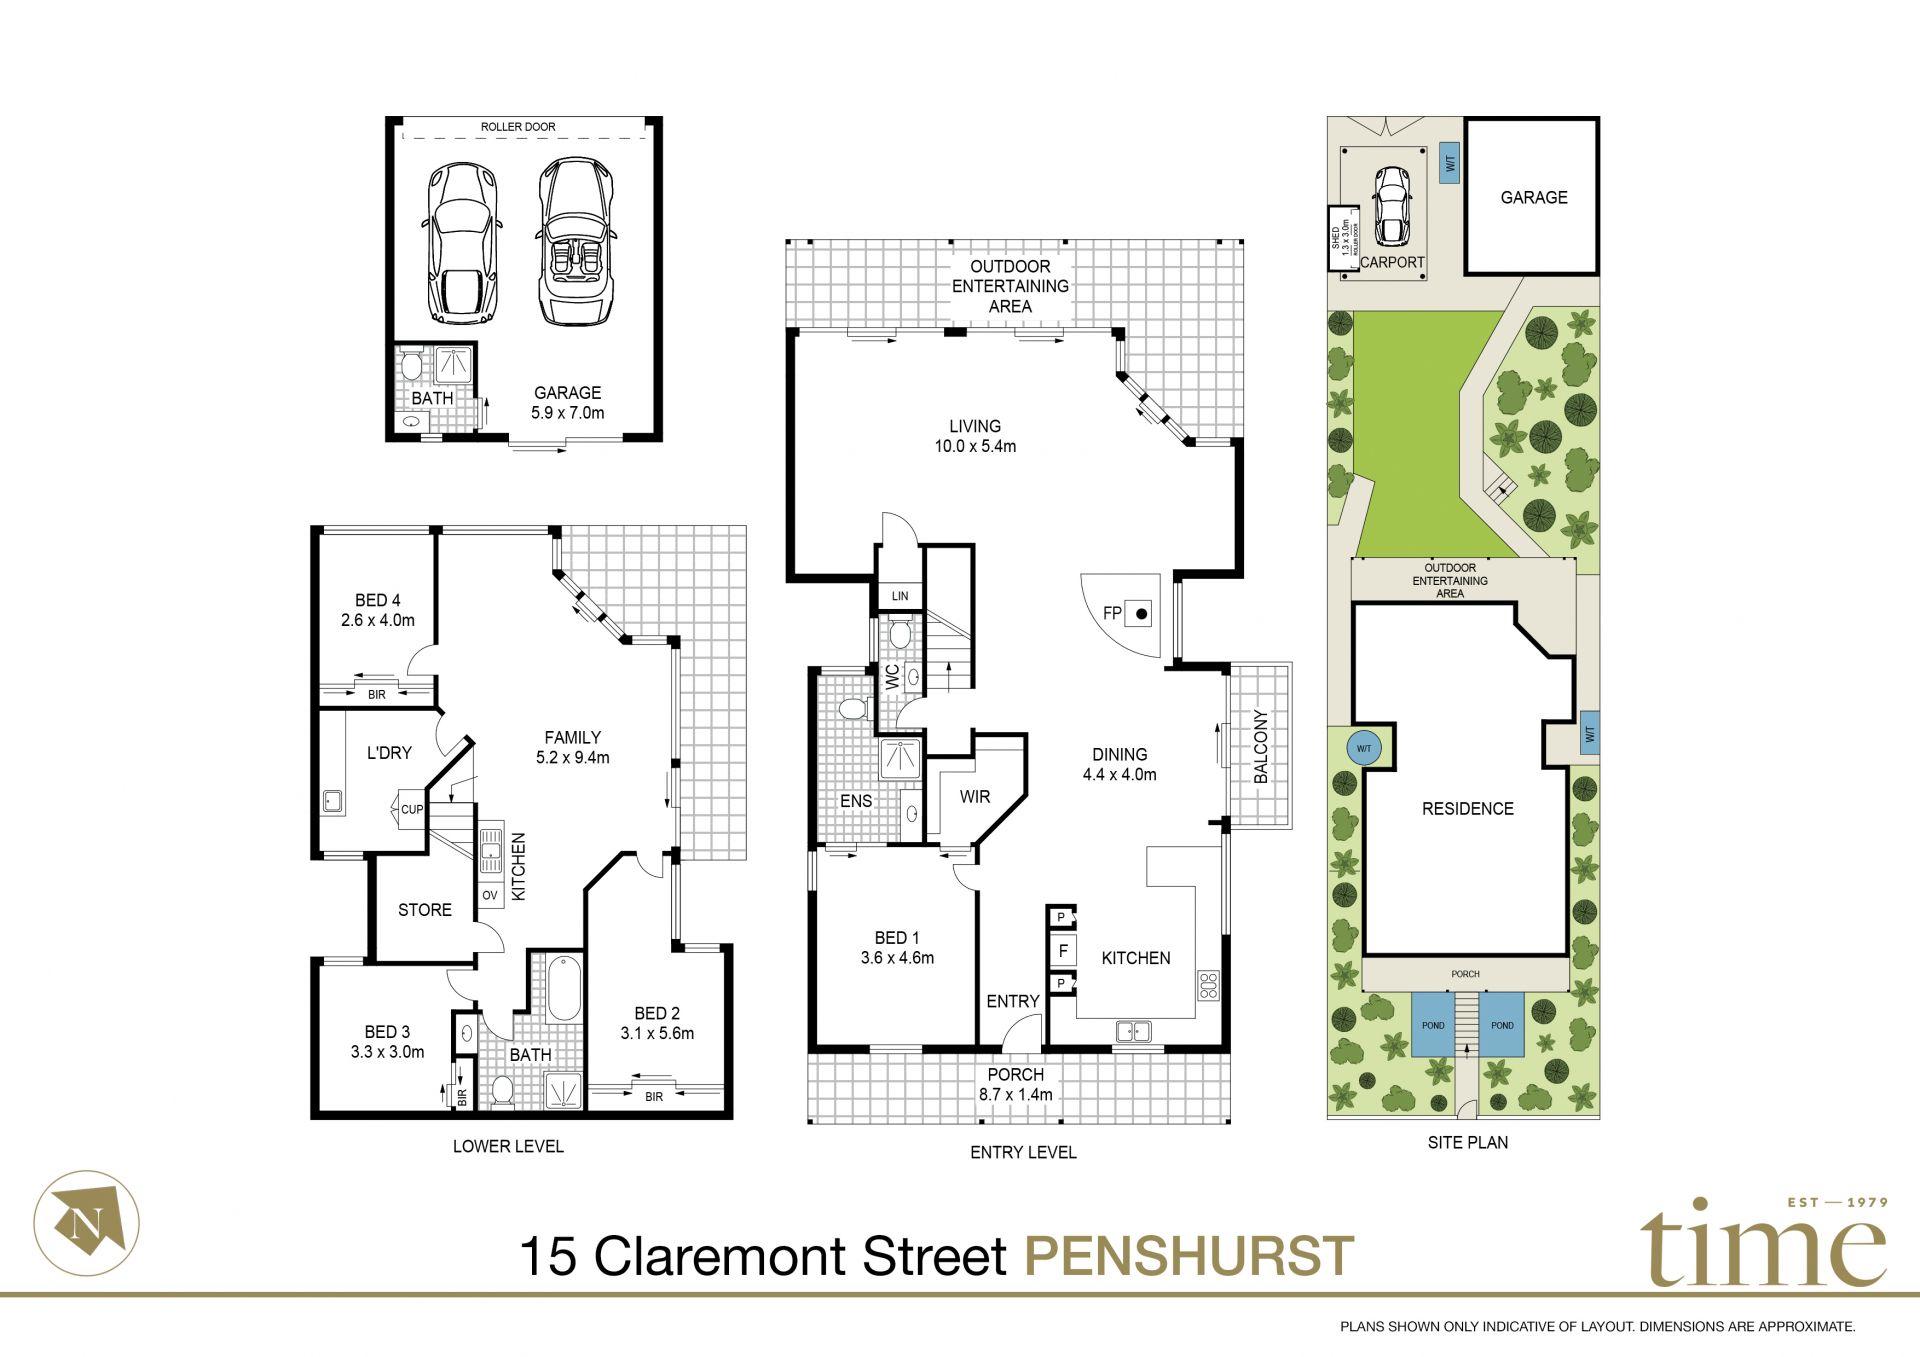 15 Claremont Street, Penshurst NSW